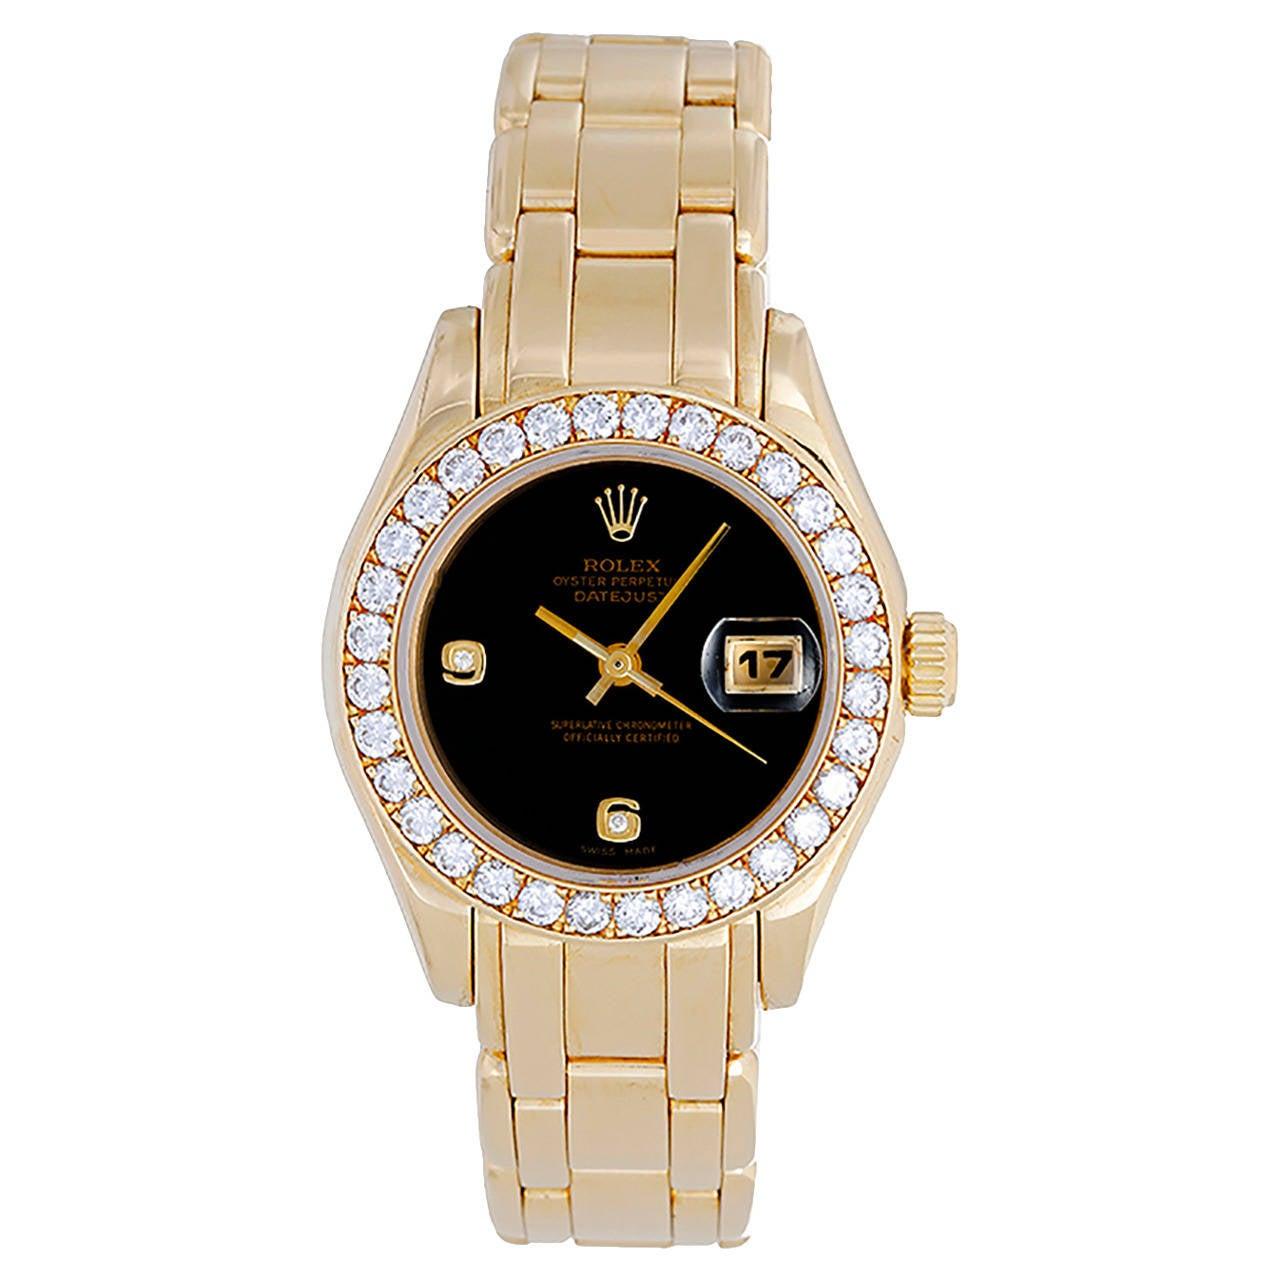 Rolex Lady's Yellow Gold Diamond Masterpiece Pearlmaster Wristwatch Ref 69298 1